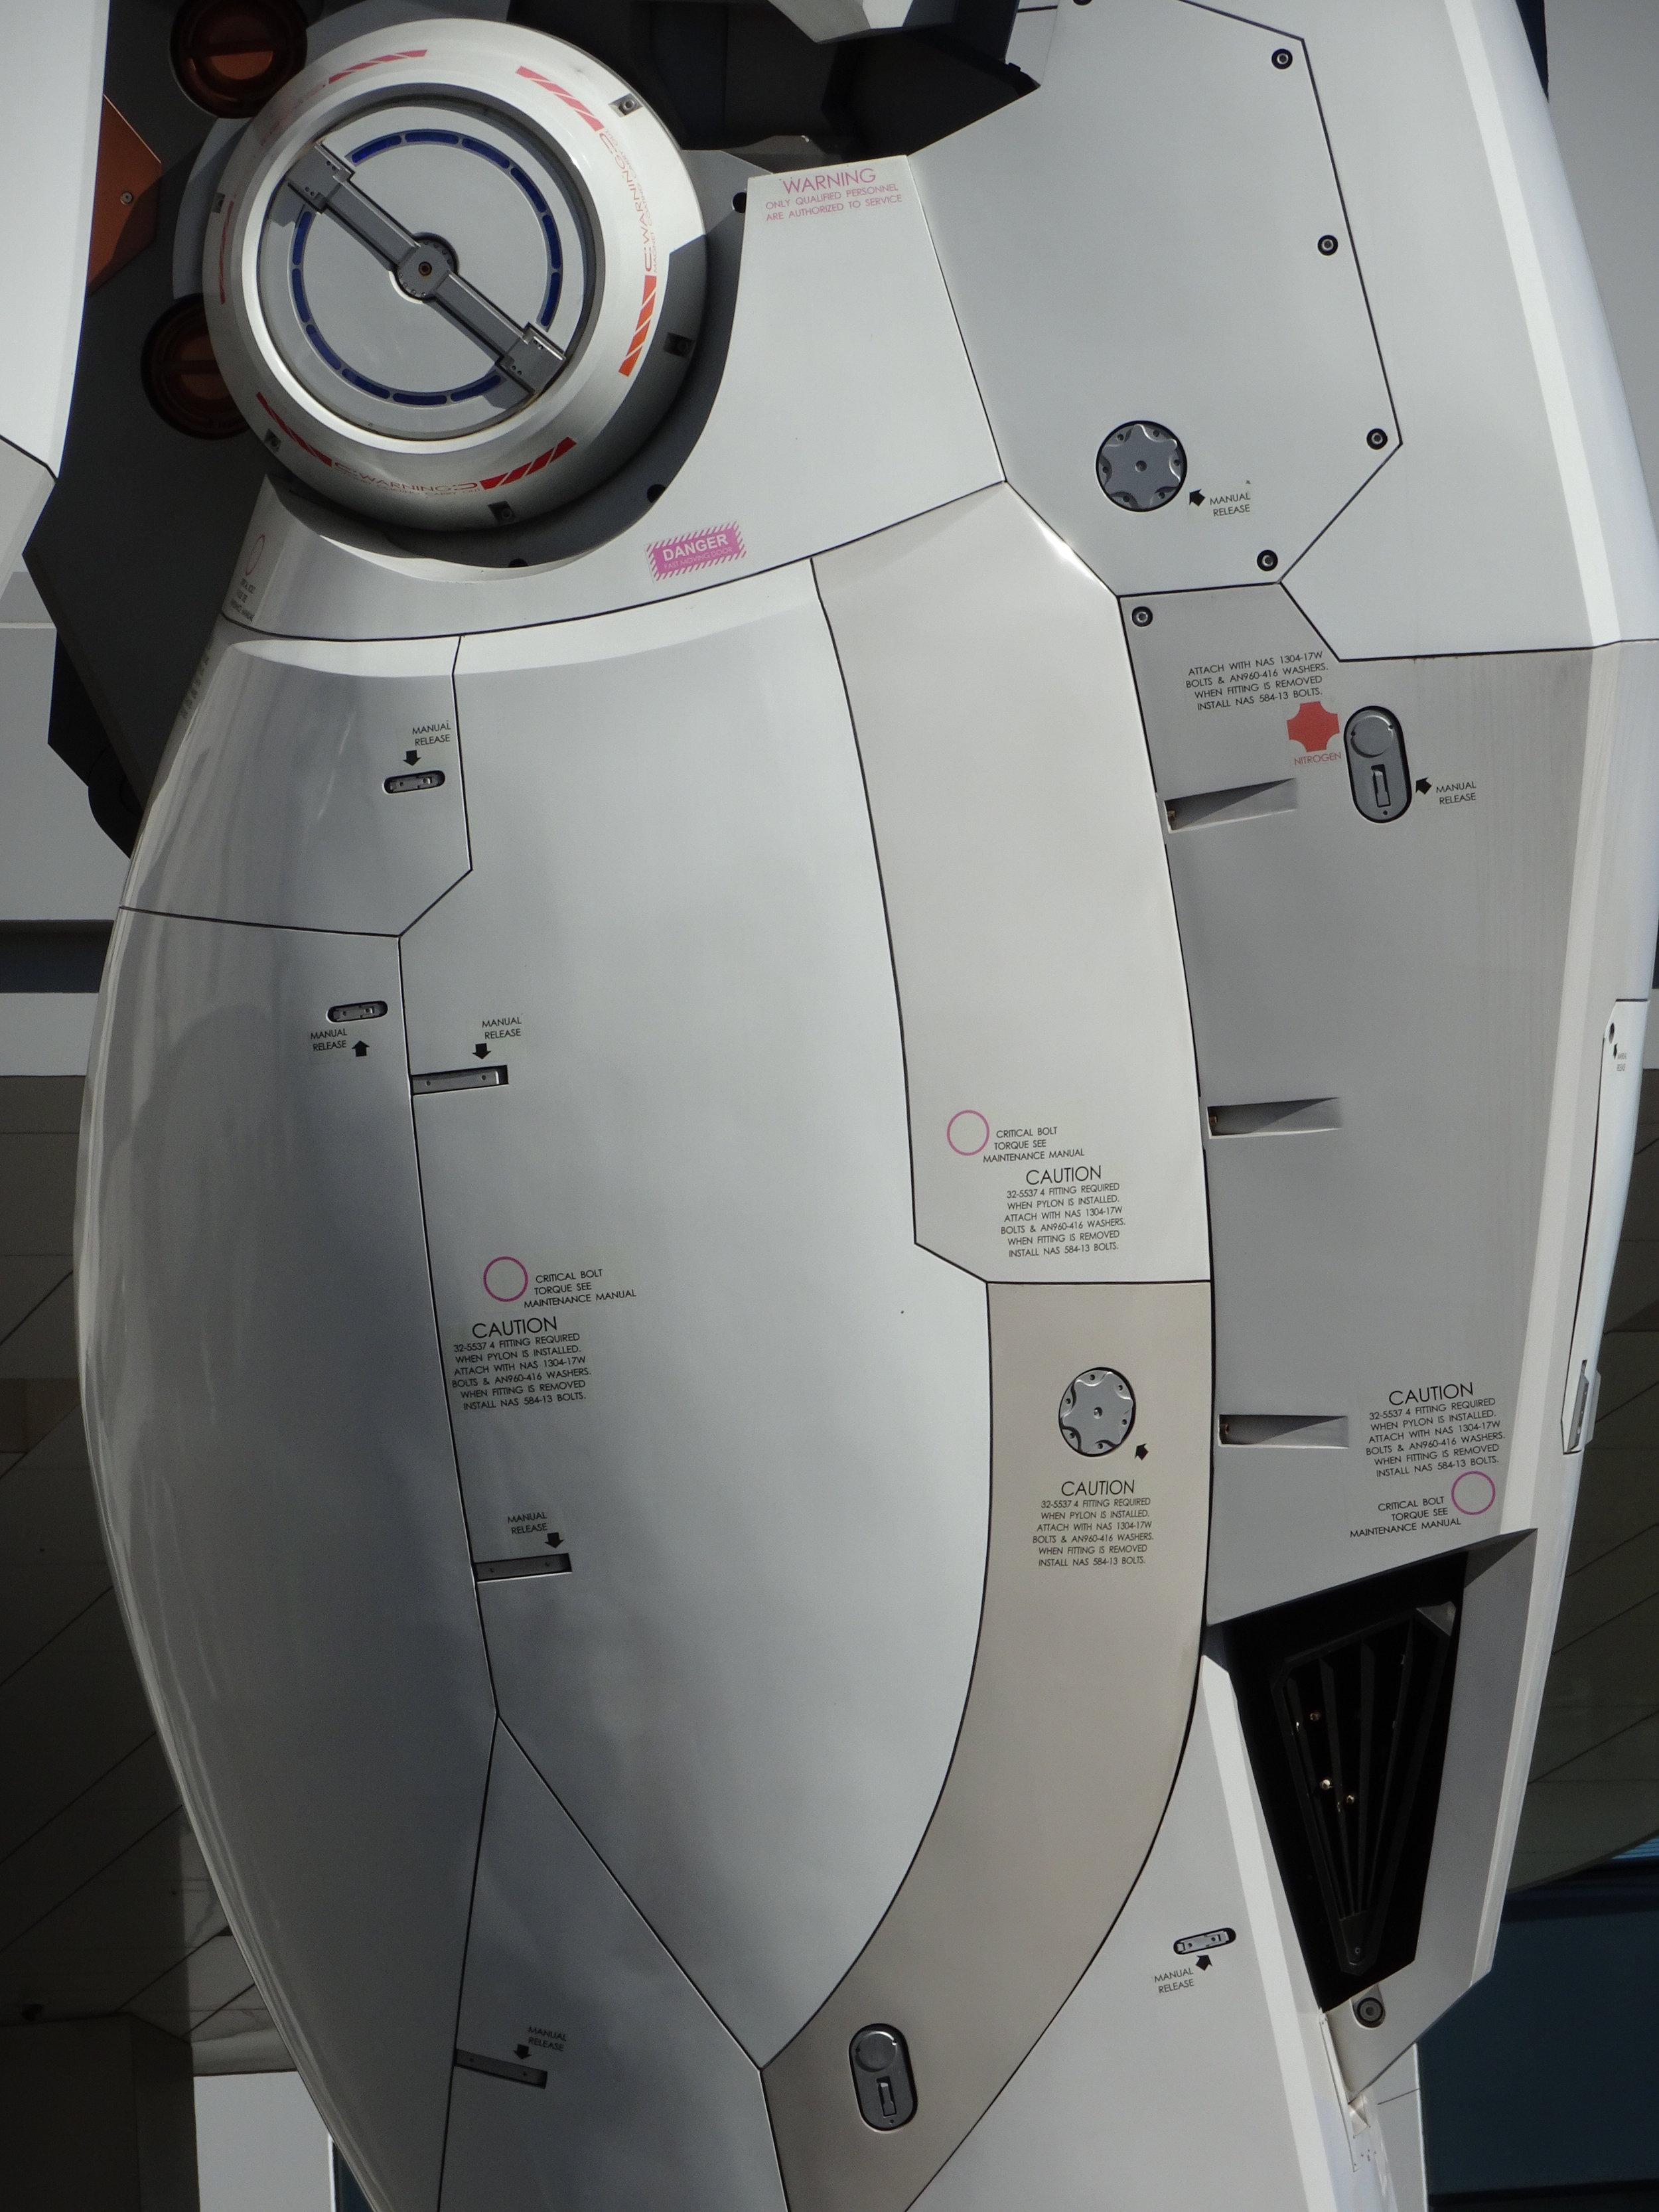 RX-78-2 Gundam 1-1 Statue - 023.jpg